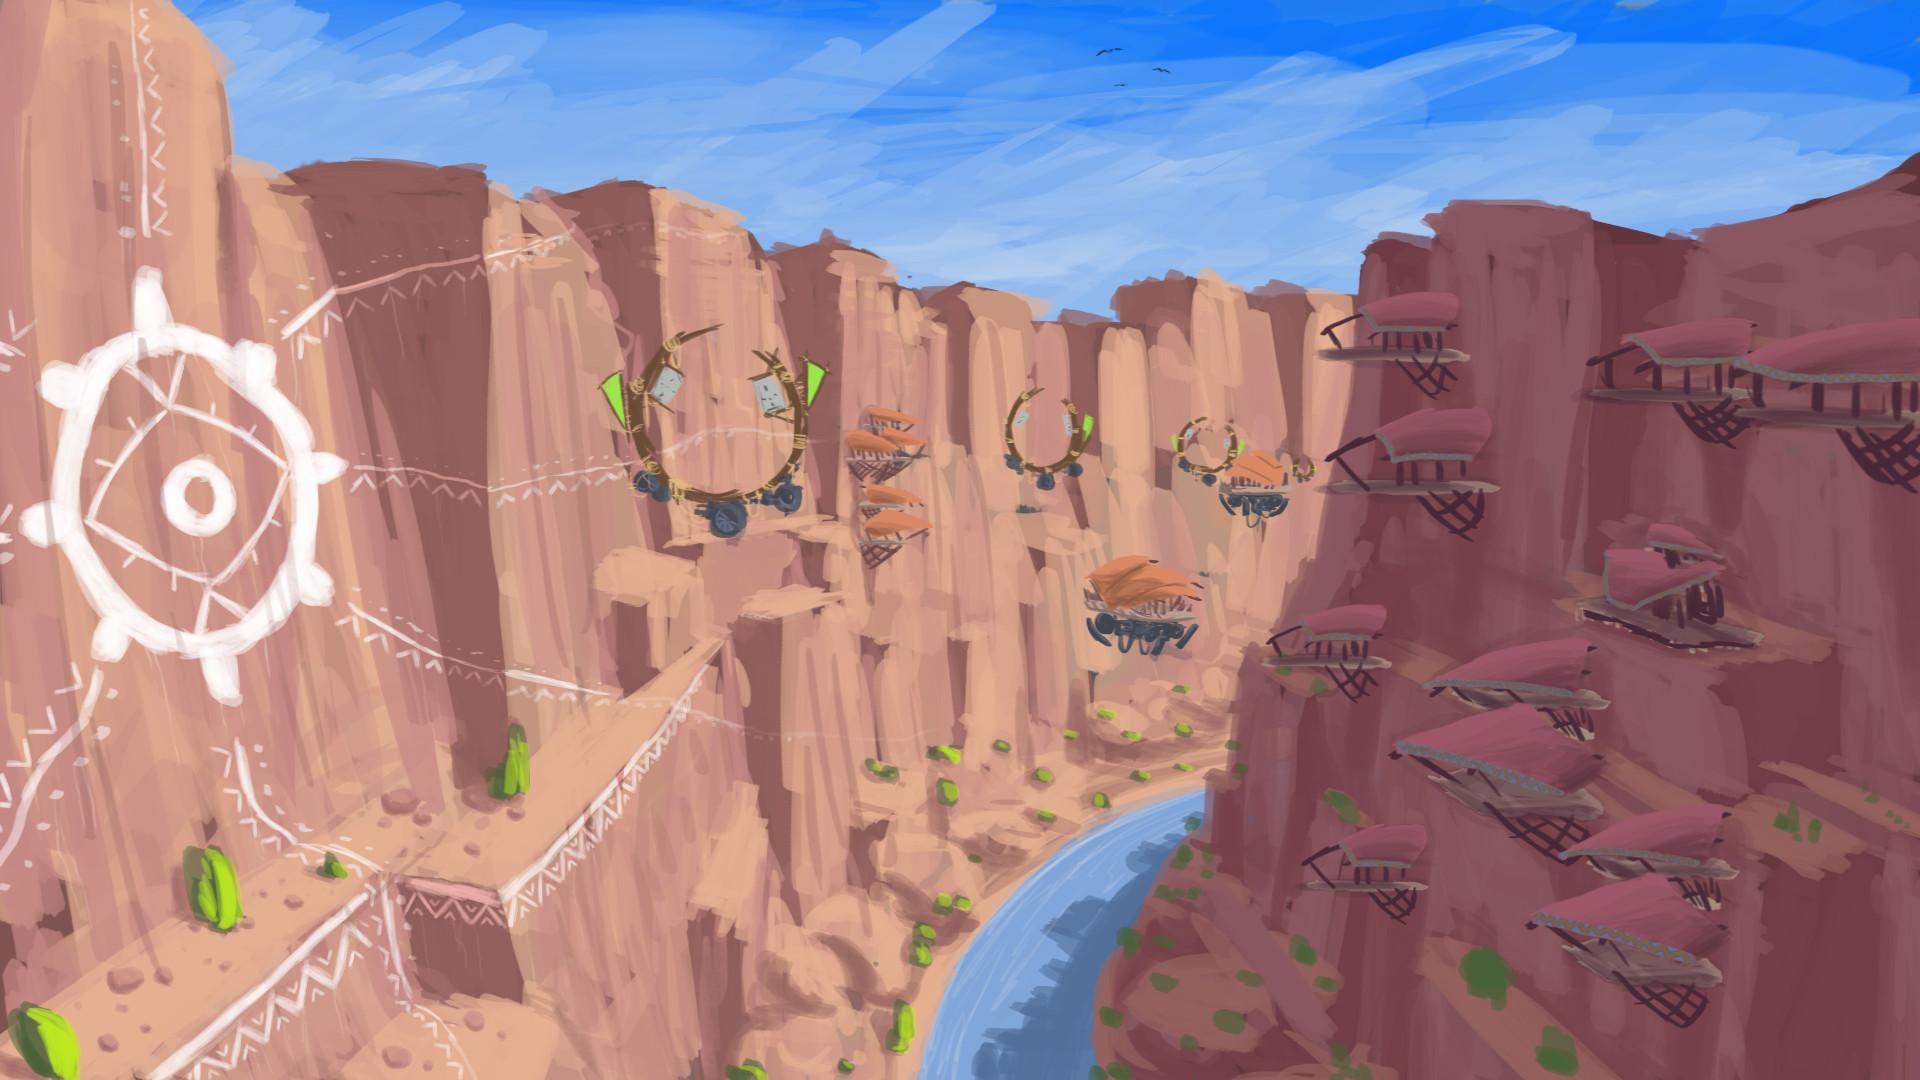 Ralf hakkesteegt canyonoverviewmuralsshot001